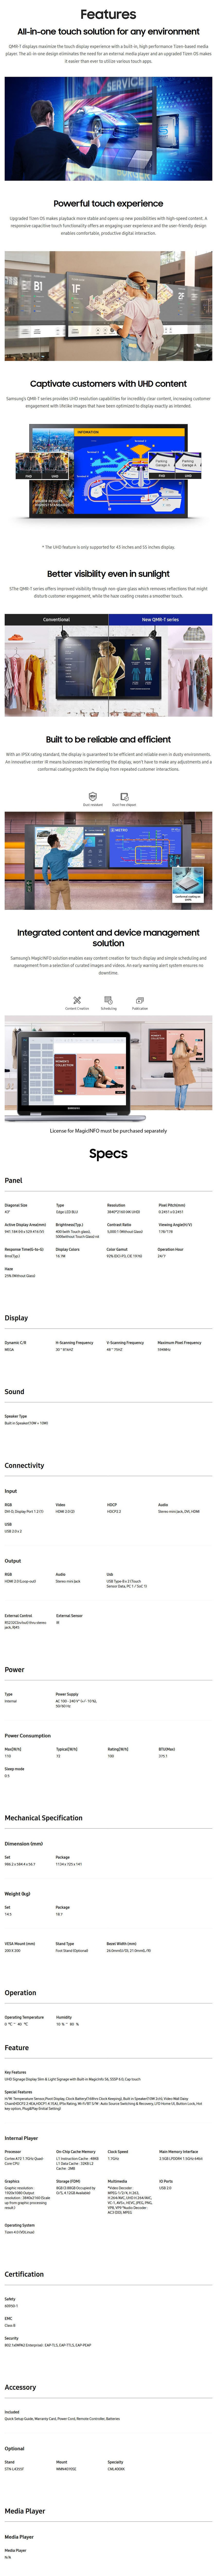 samsung-qmrt-series-43-4k-uhd-167-350nit-commercial-display-ac38435-6.jpg